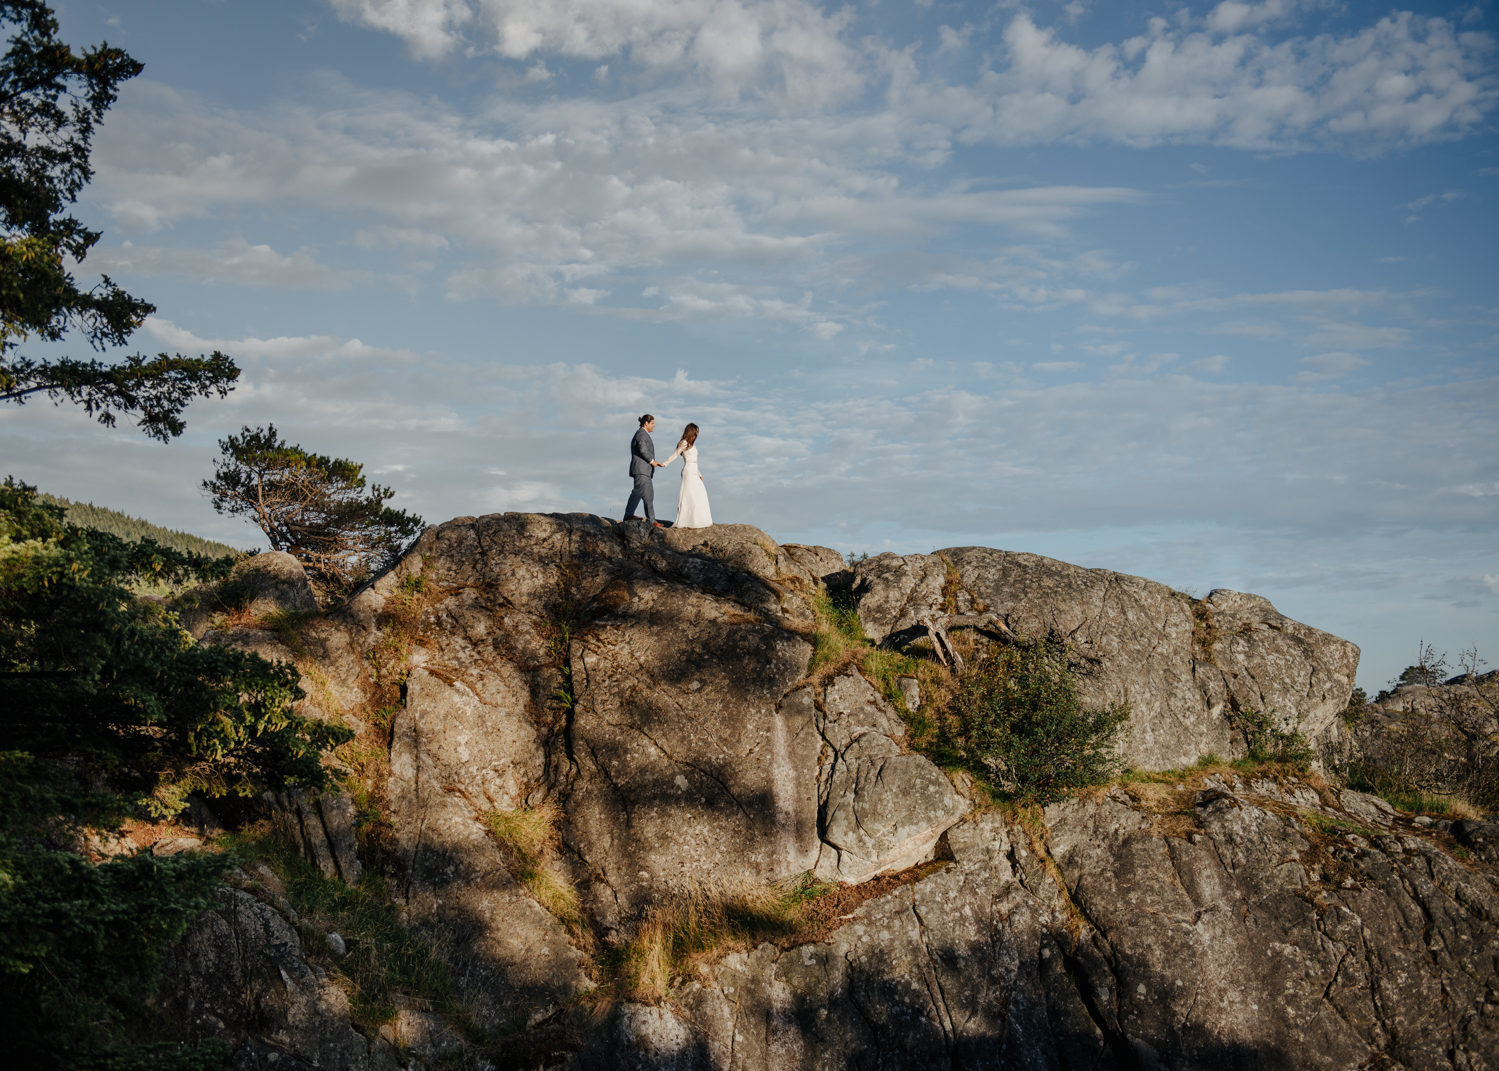 kaoverii_silva_photographer_lison_iman_wedding_websize-310.jpg